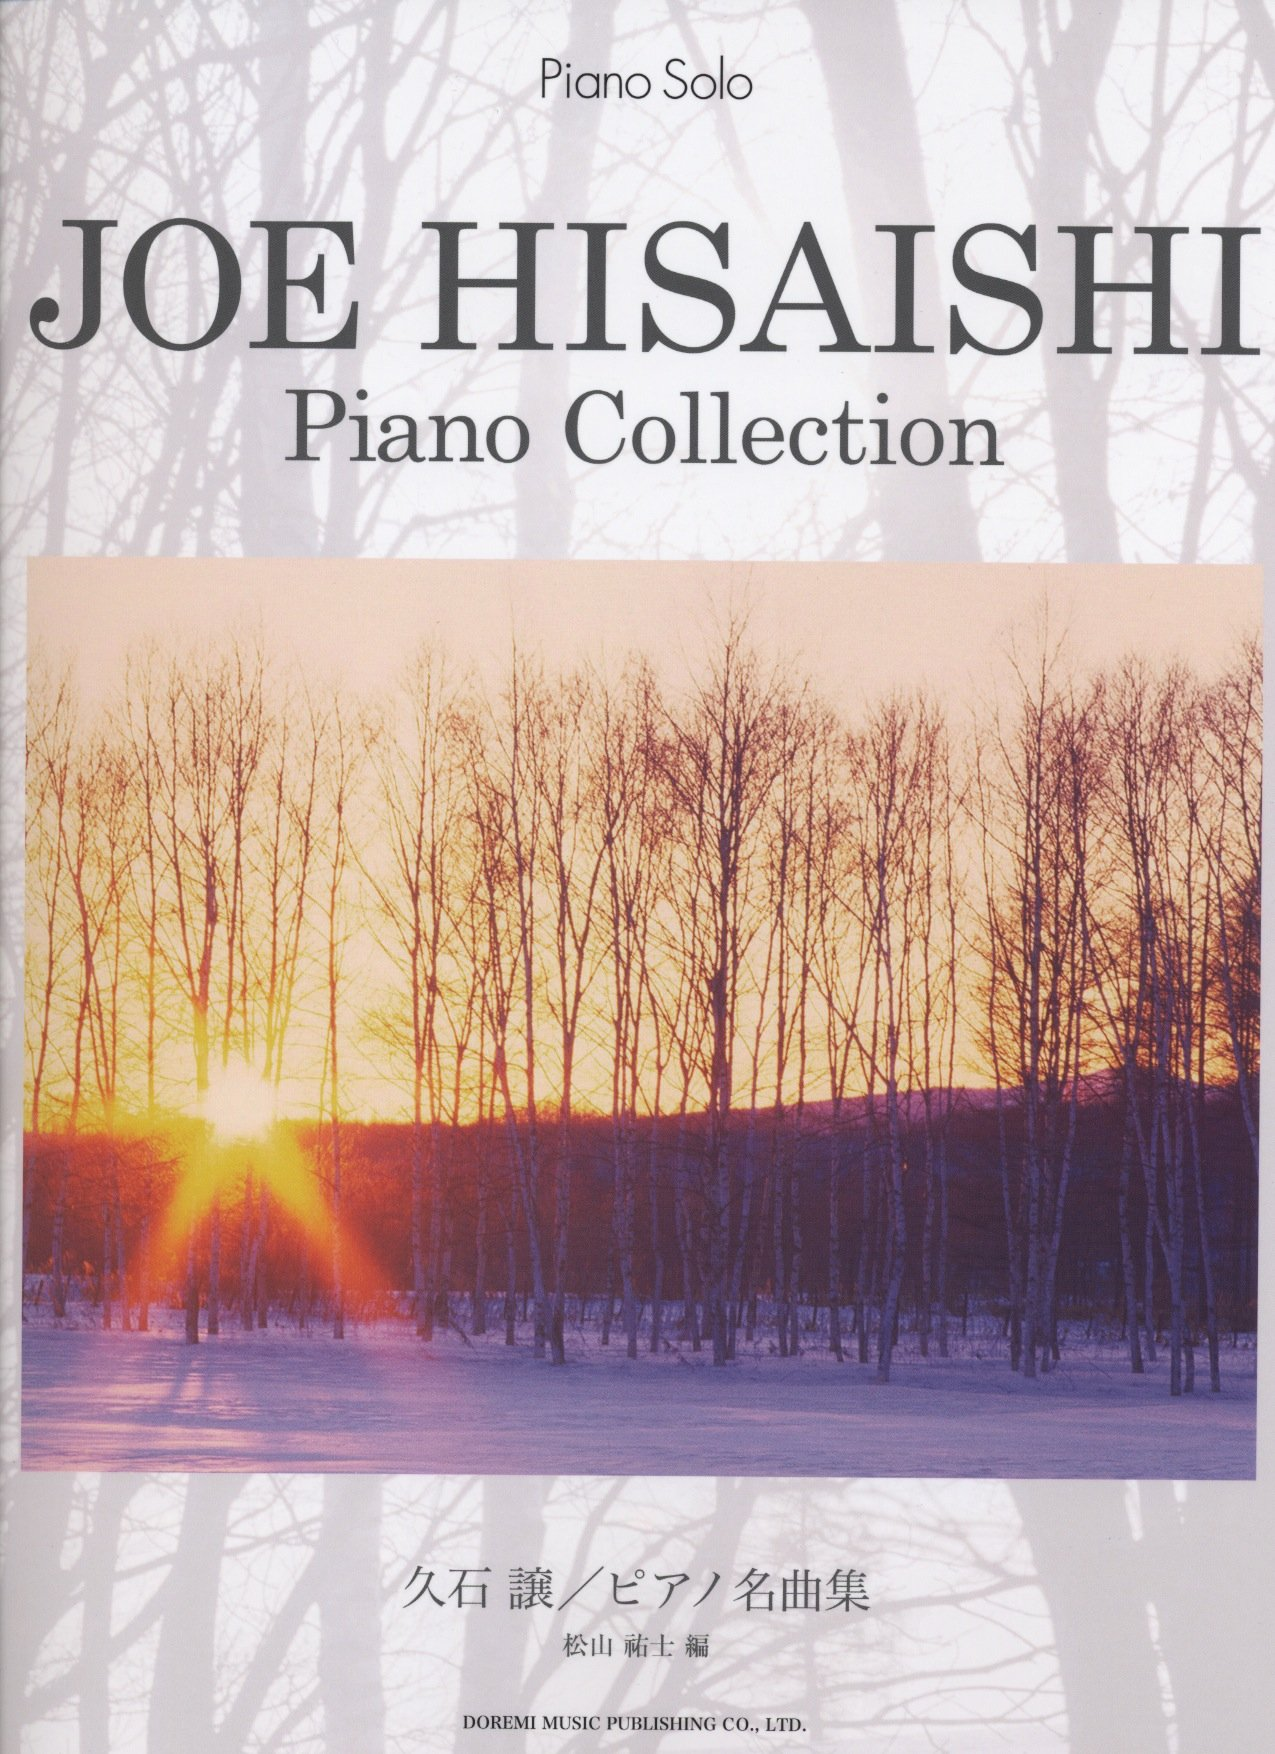 Joe Hisaishi Piano Collection Scores